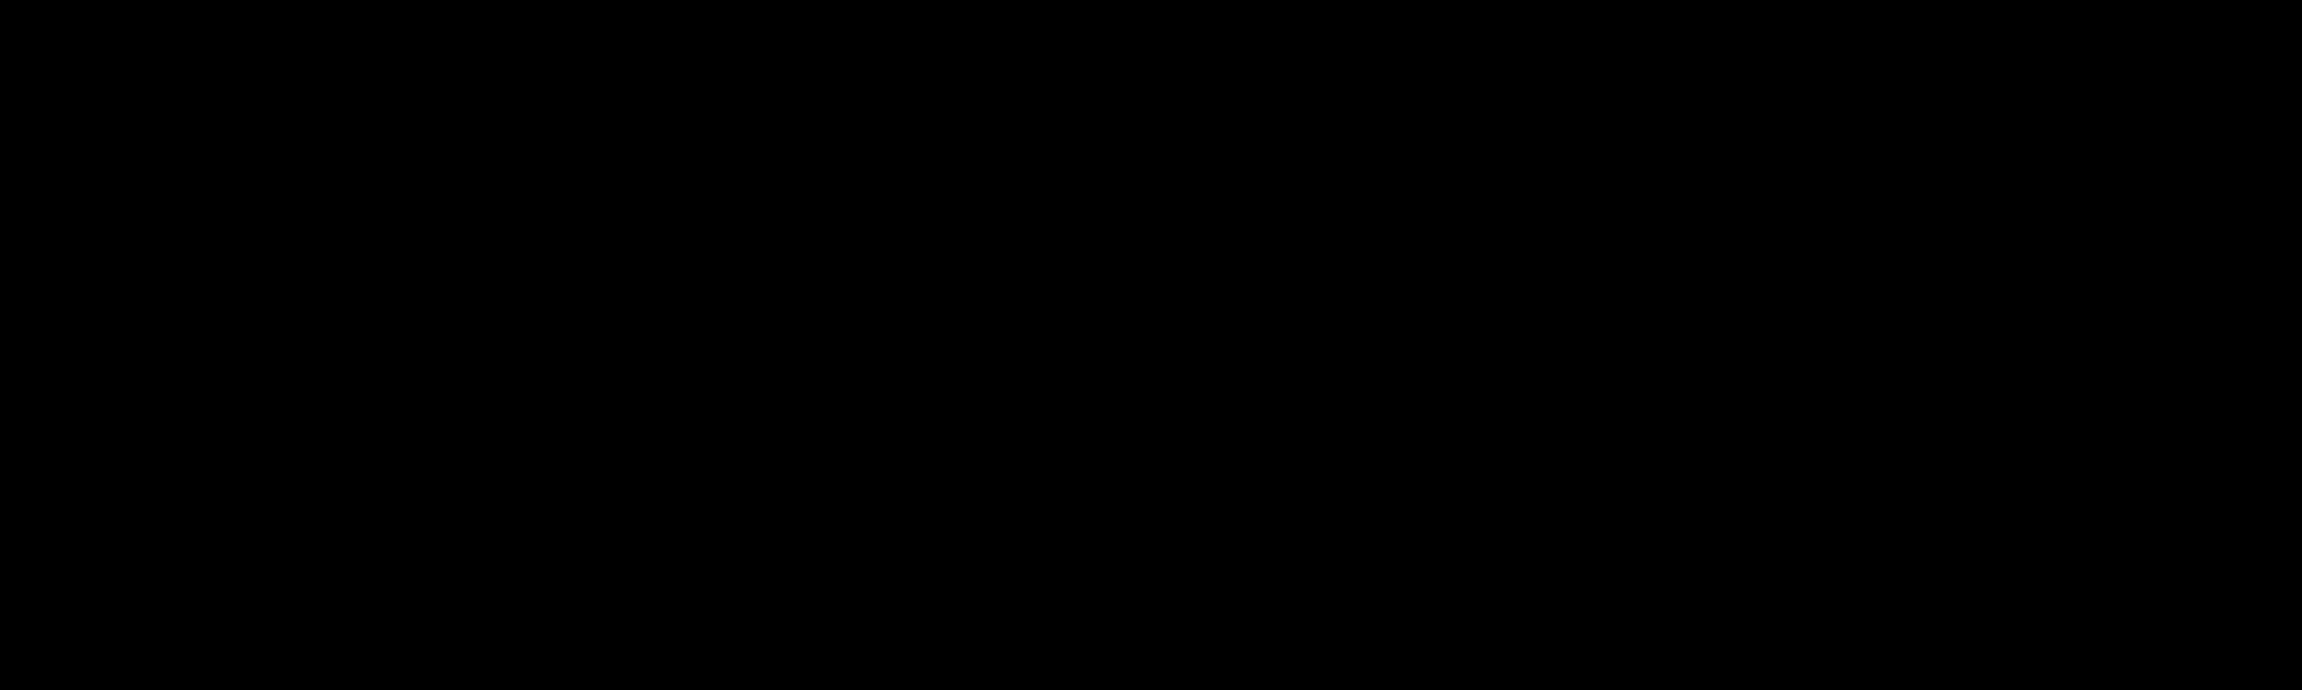 Aripiprazole-d<sub>8</sub> (butyl-d<sub>8</sub>)